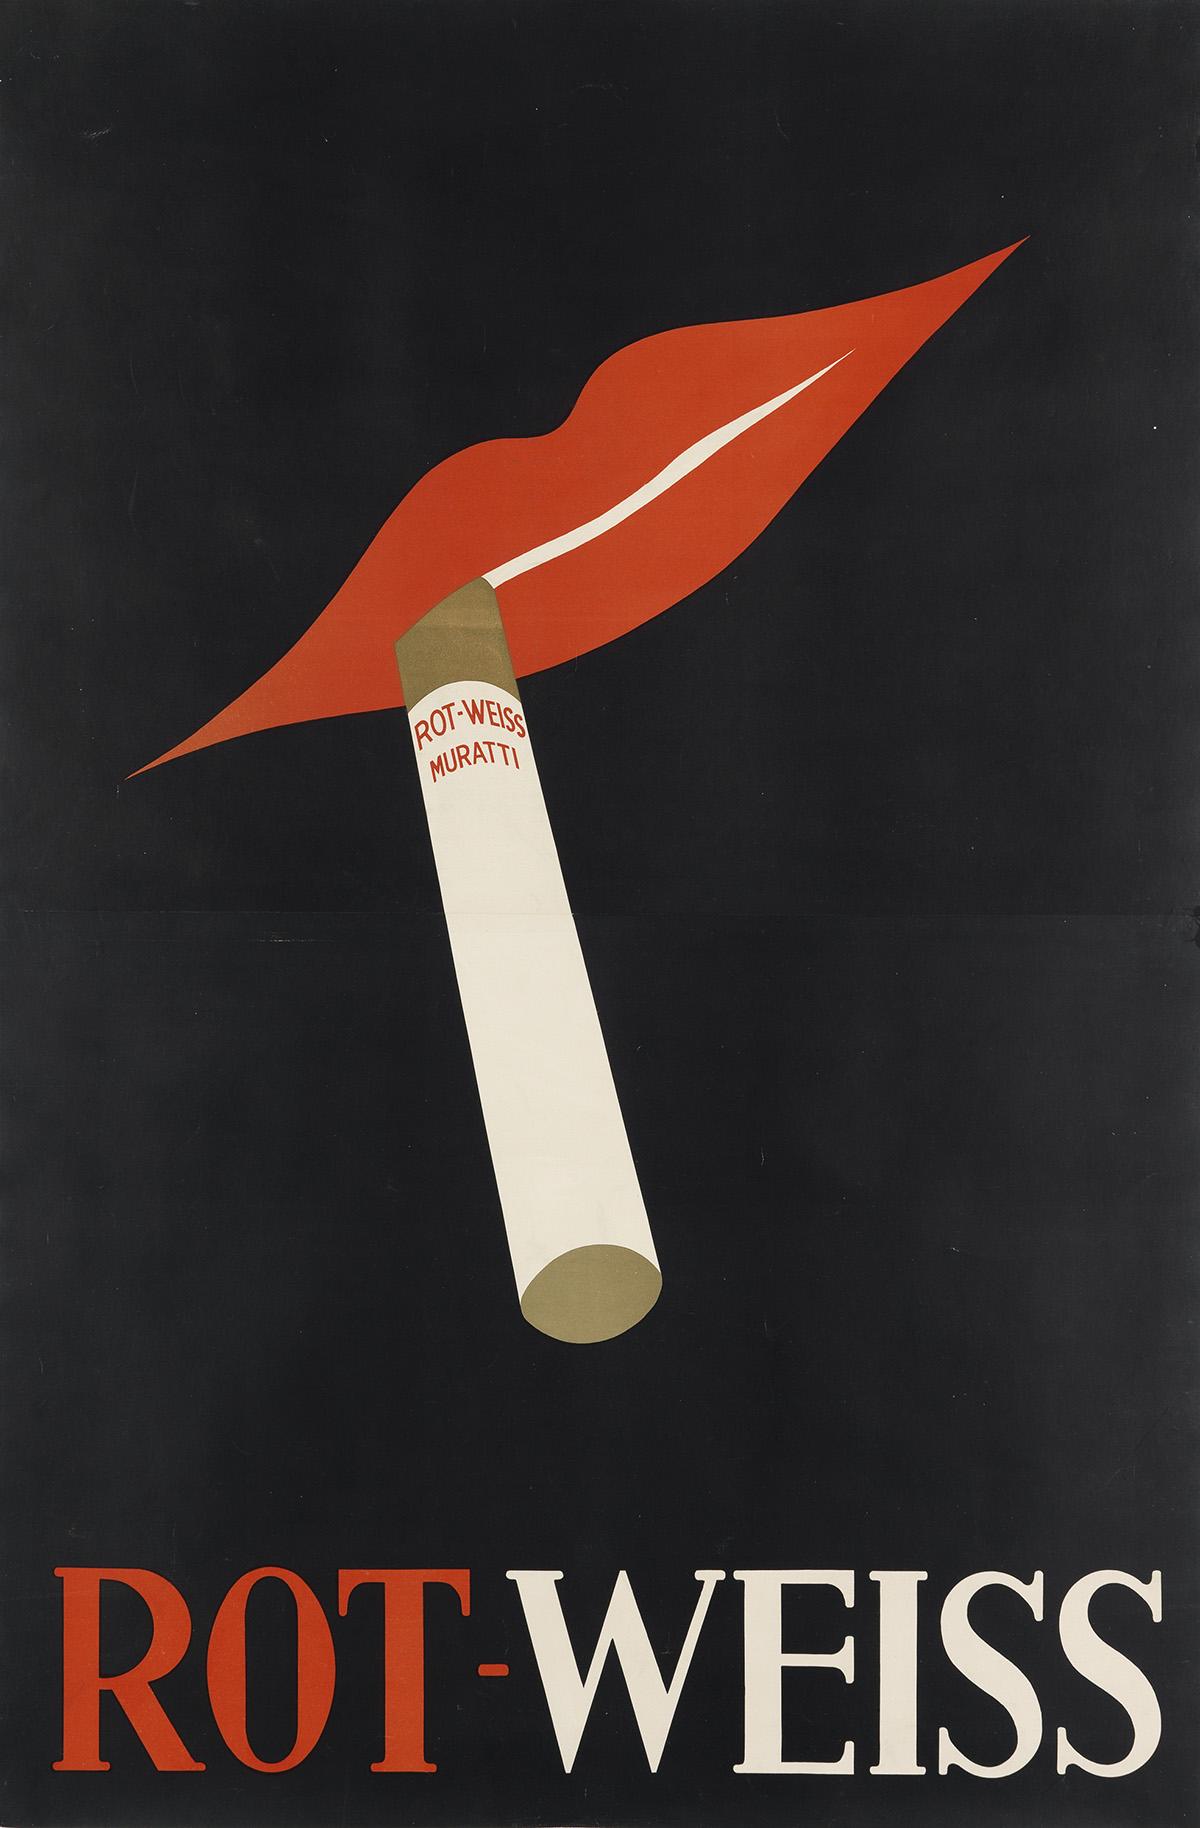 DESIGNER-UNKNOWN-ROT---WEISS-MURATTI-Circa-1931-56x37-inches